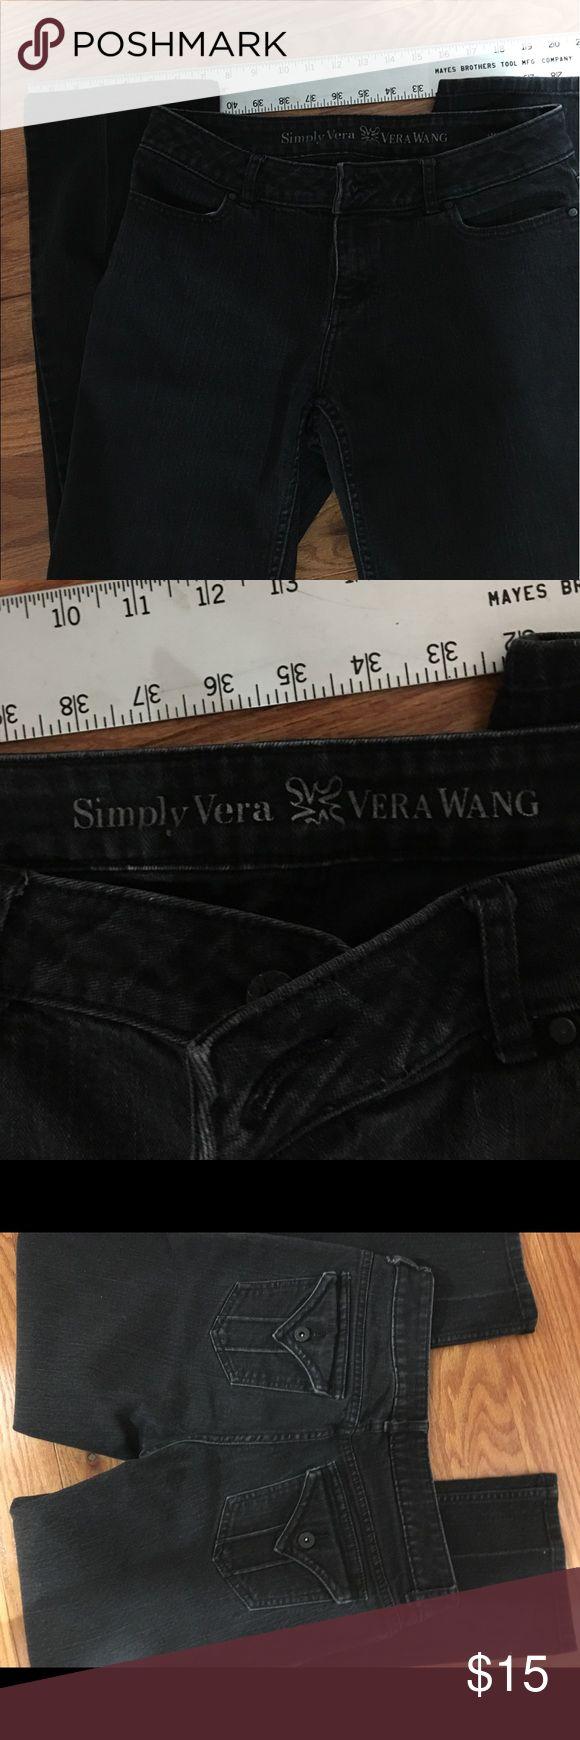 Simply Vera Vera Wang Jeans Simply Vera Vera Wang Black Jeans, Size 8, straight leg. Smoke Free Owner/Home. Simply Vera Vera Wang Jeans Straight Leg